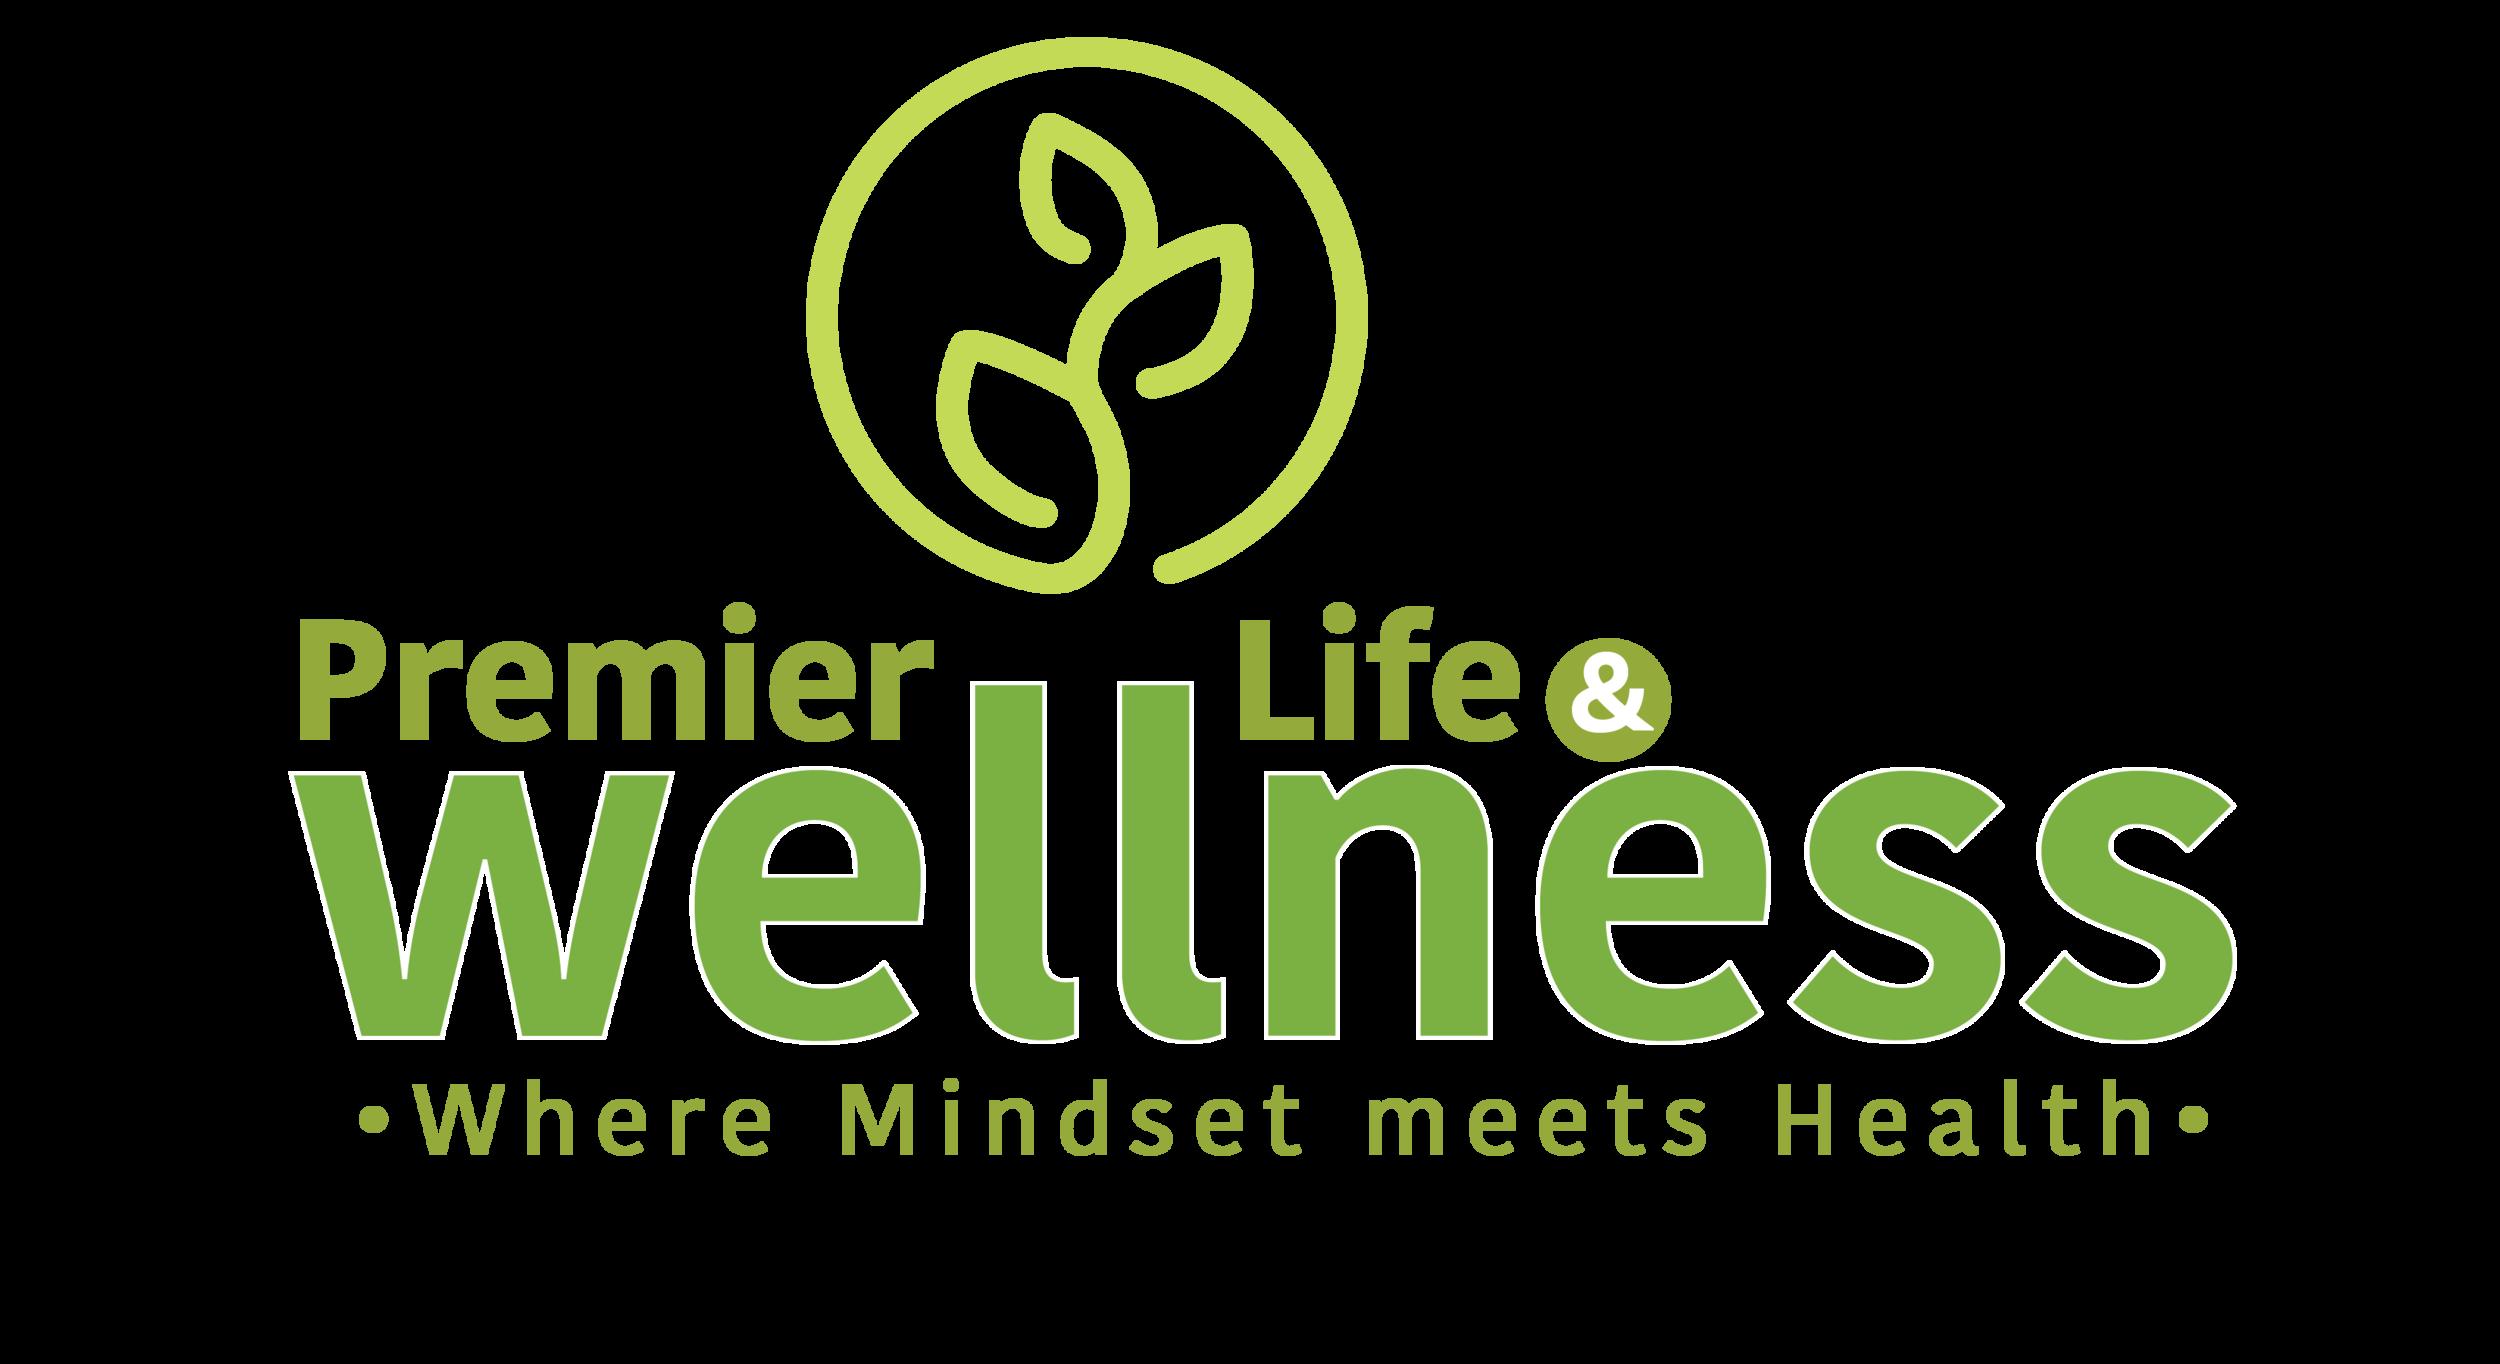 PremierLife&Wellness_LOGO-01 (1).png